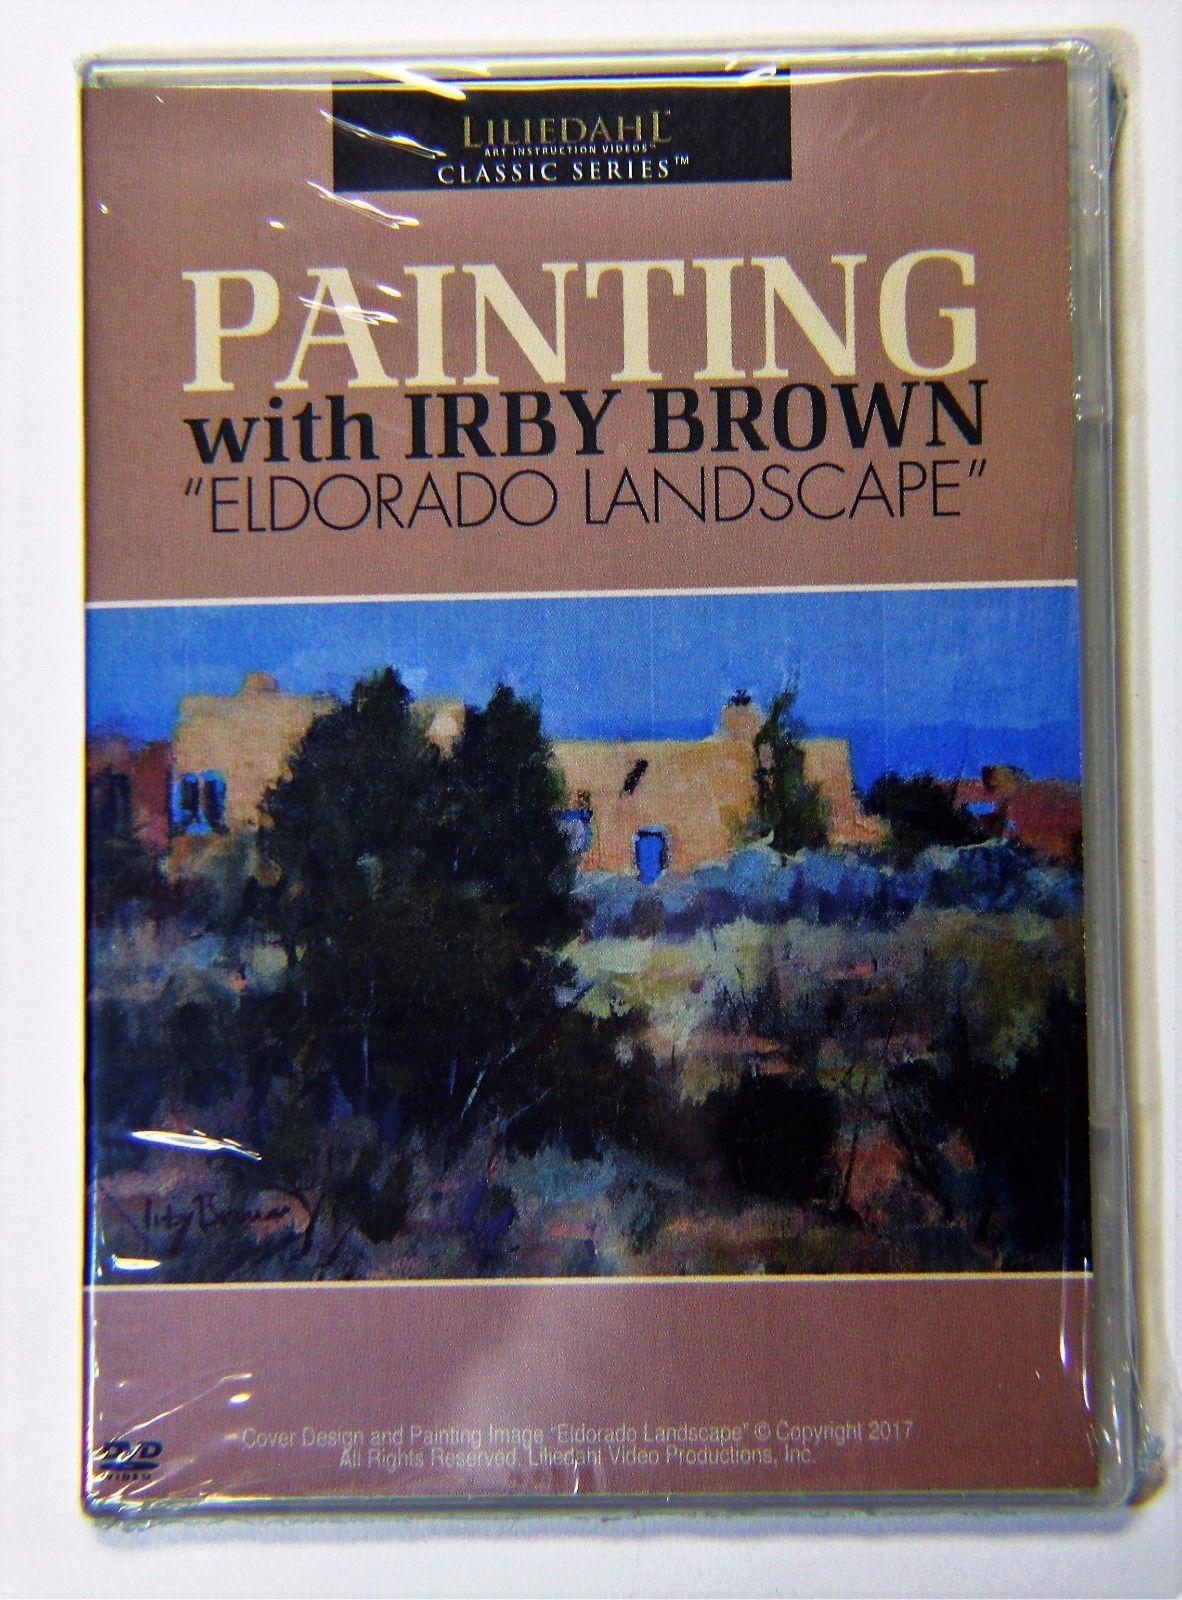 instruction books and media 160640 irby brown eldorado landscape